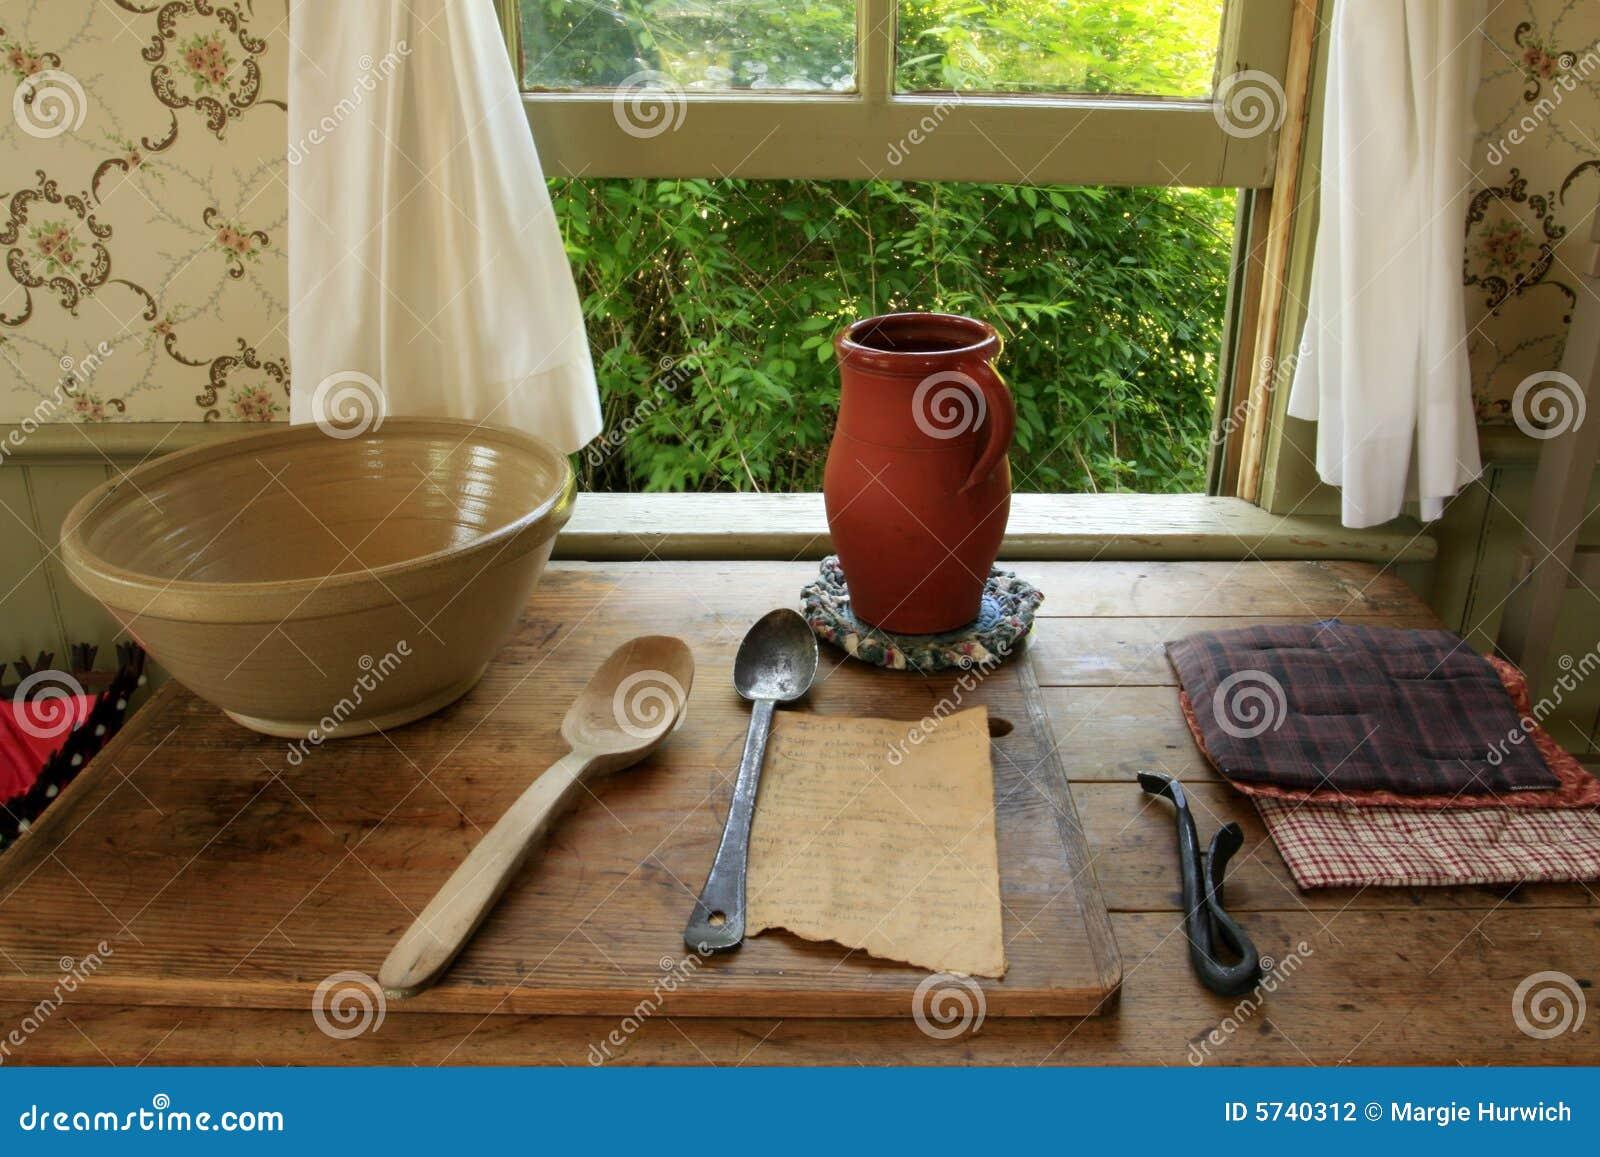 Vintage Kitchen Utensils Stock Photography Image 5740312